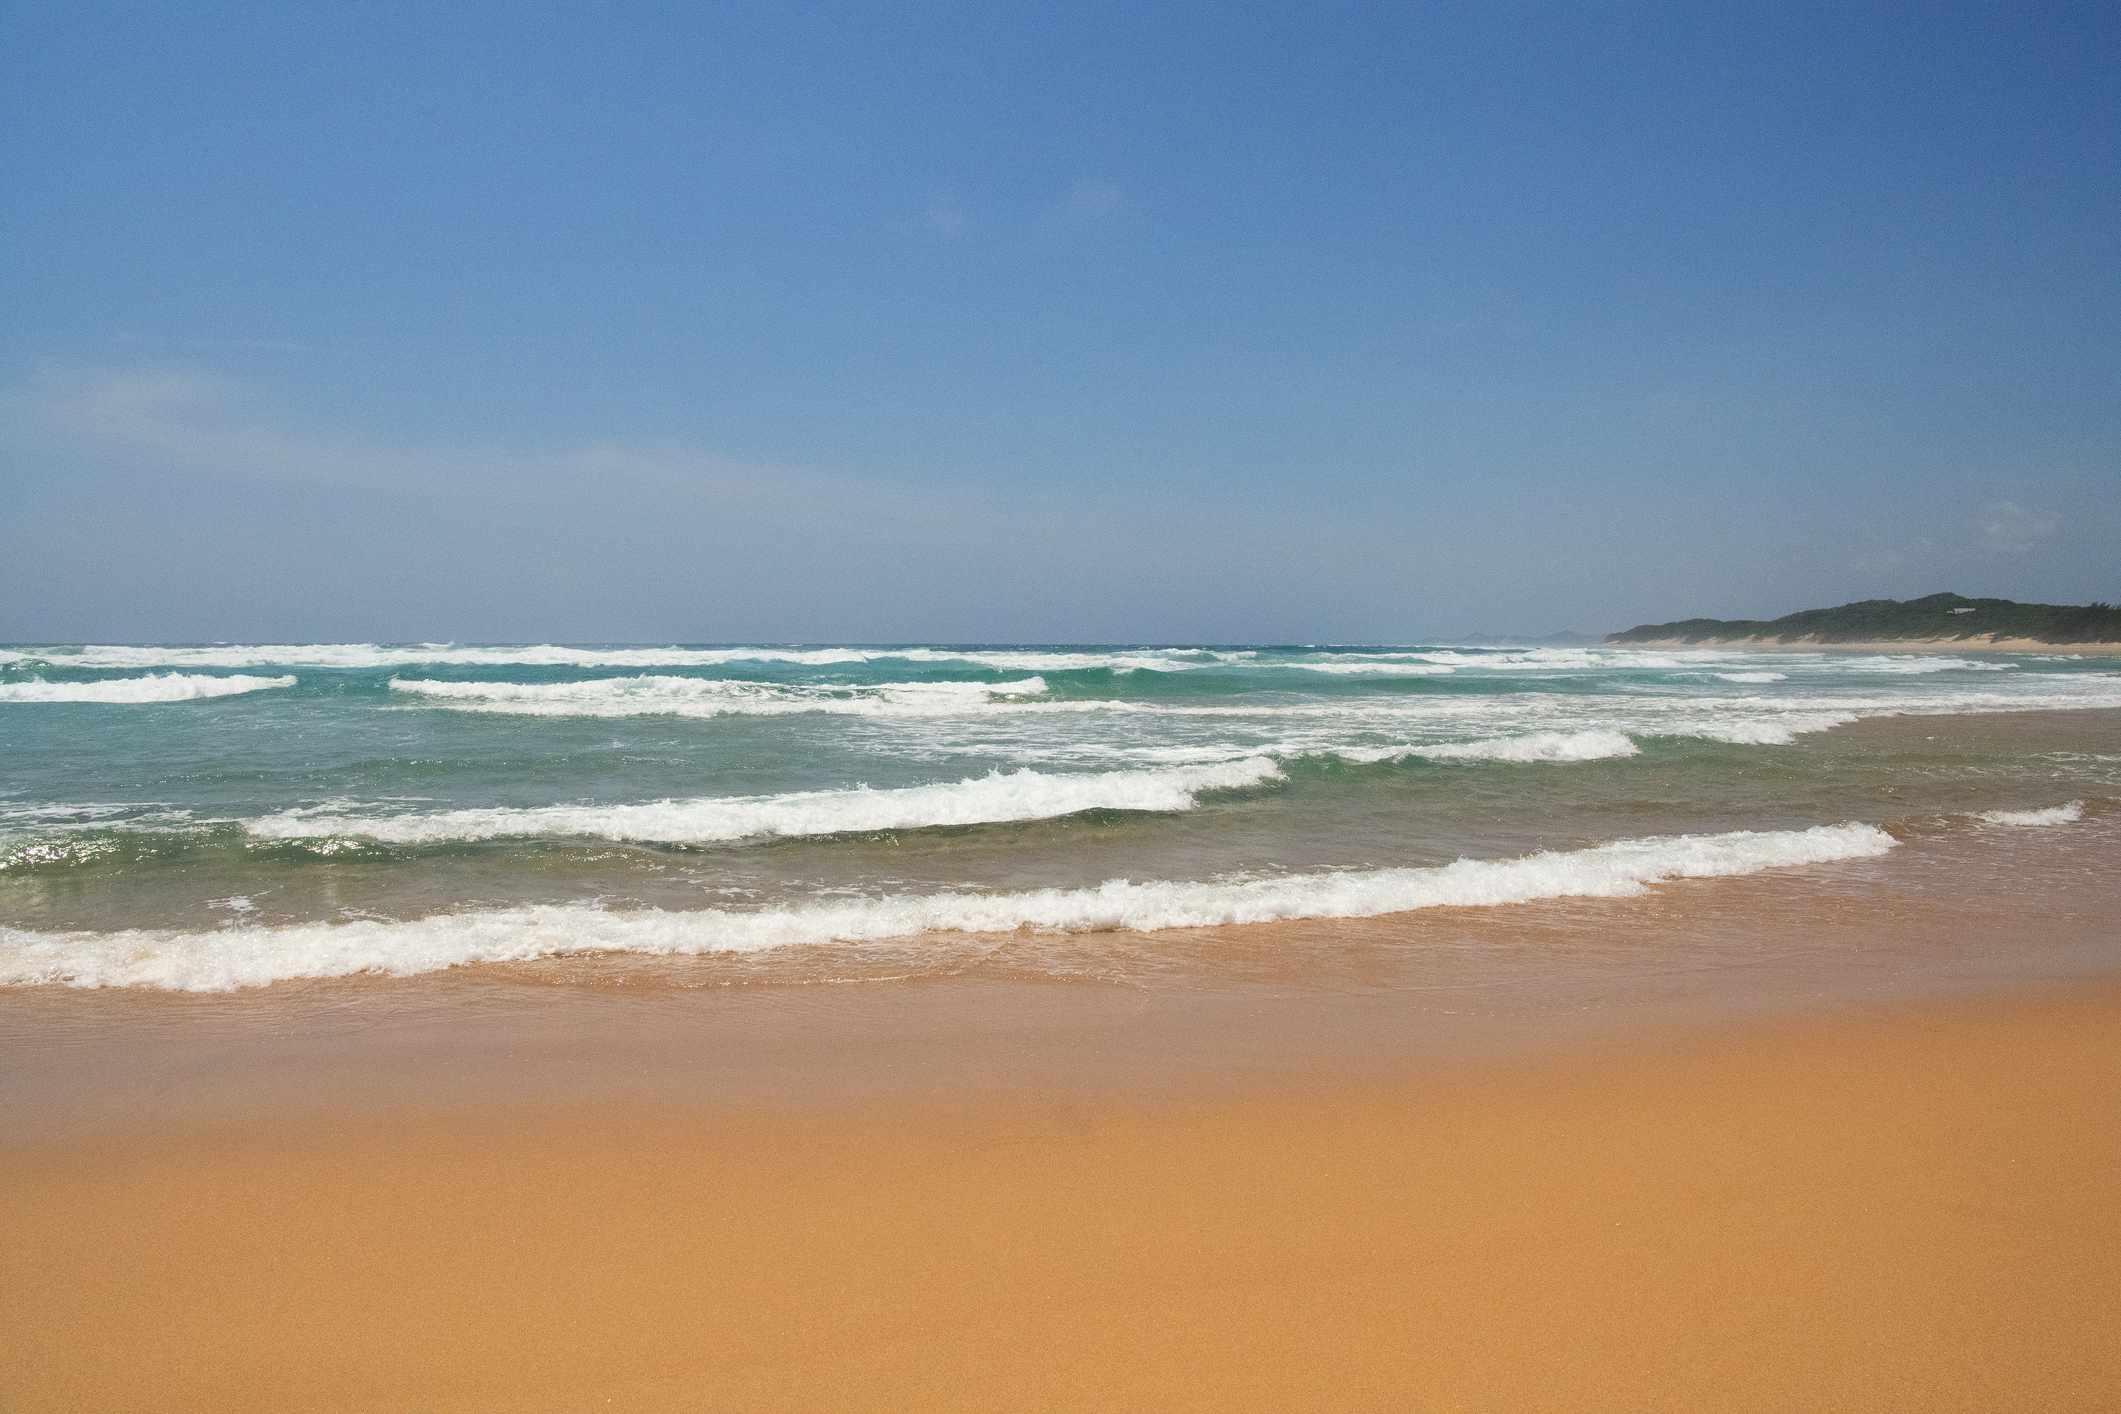 small waves crashing on a golden sand beach